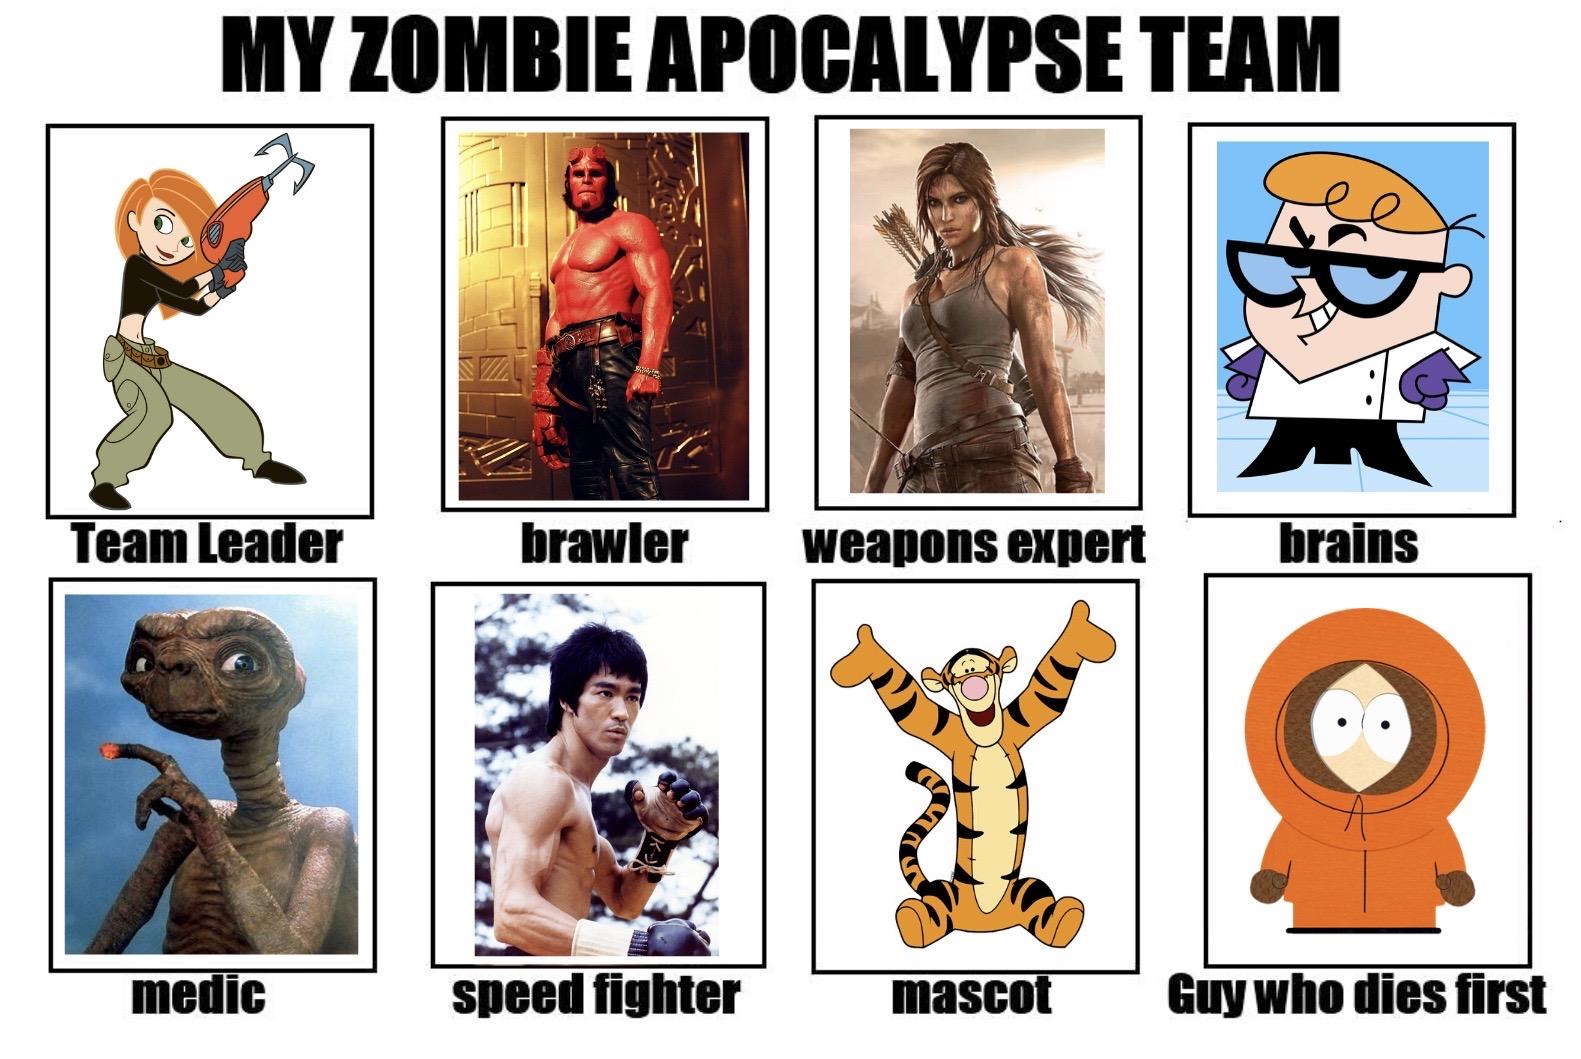 My Zombie Apocalypse Team by ThePinkWater on DeviantArt